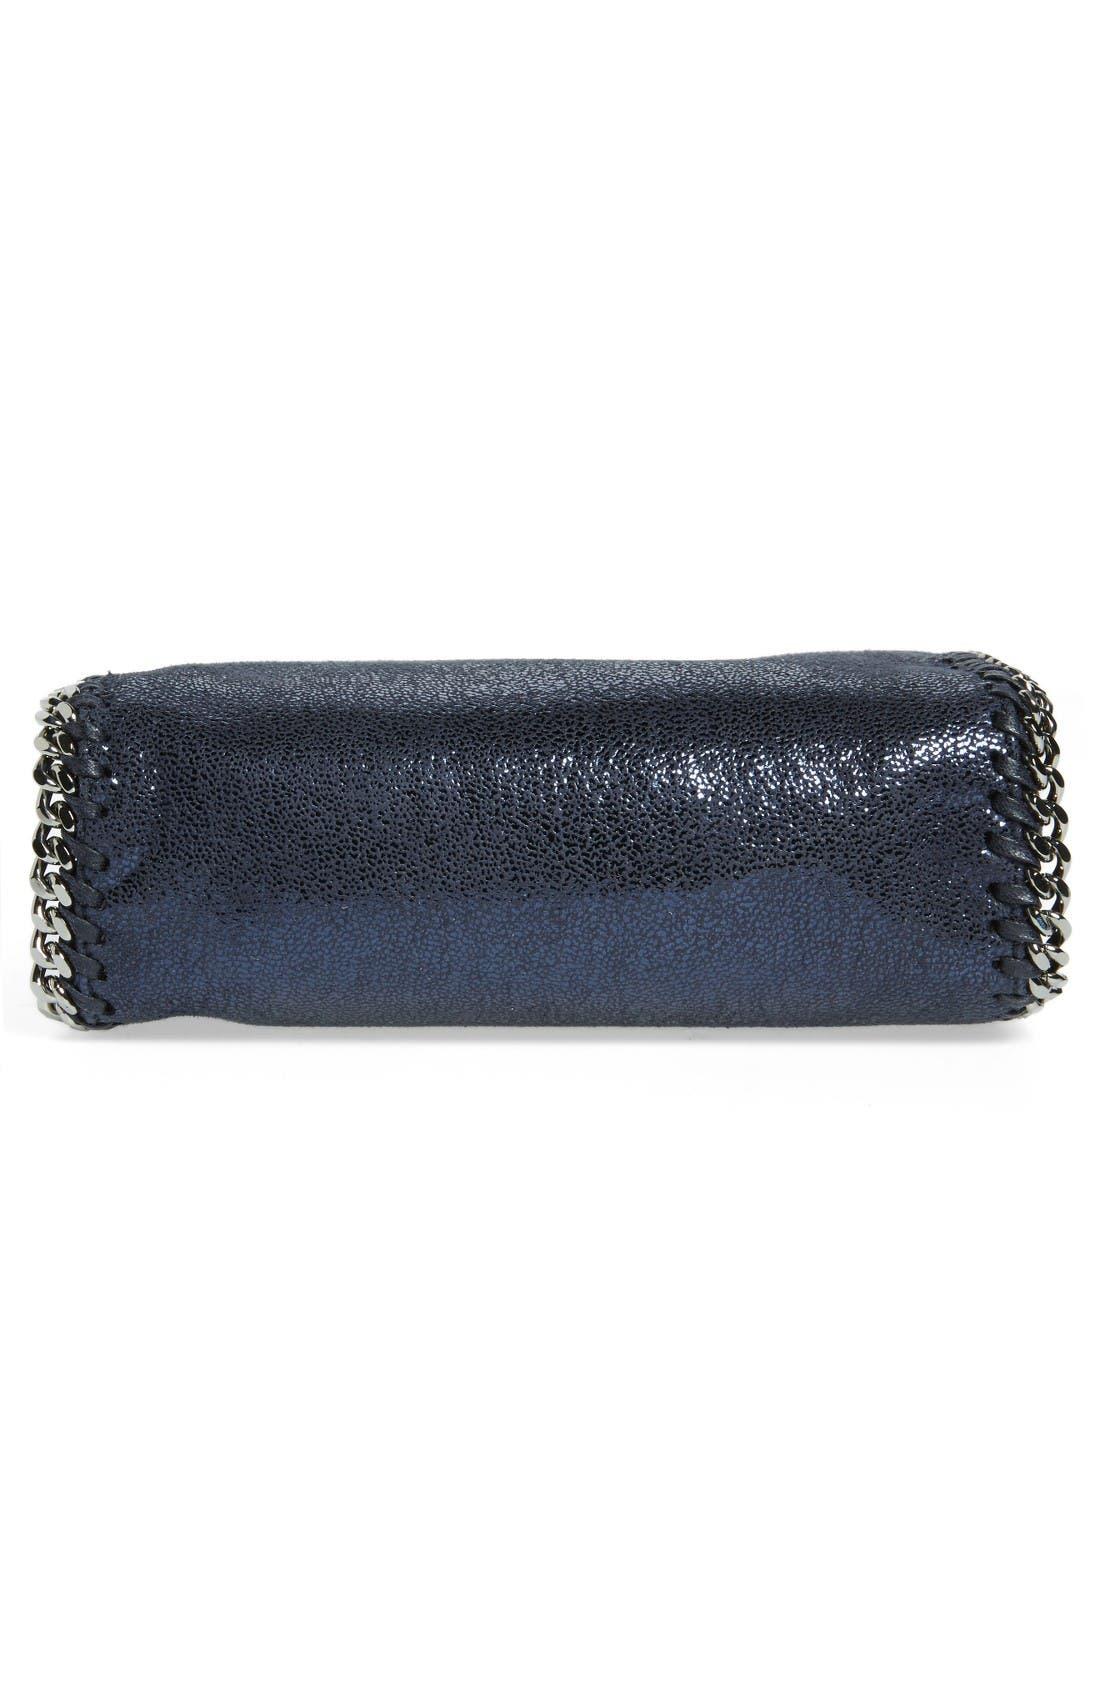 'Tiny Falabella' Metallic Faux Leather Crossbody Bag,                             Alternate thumbnail 5, color,                             Ink